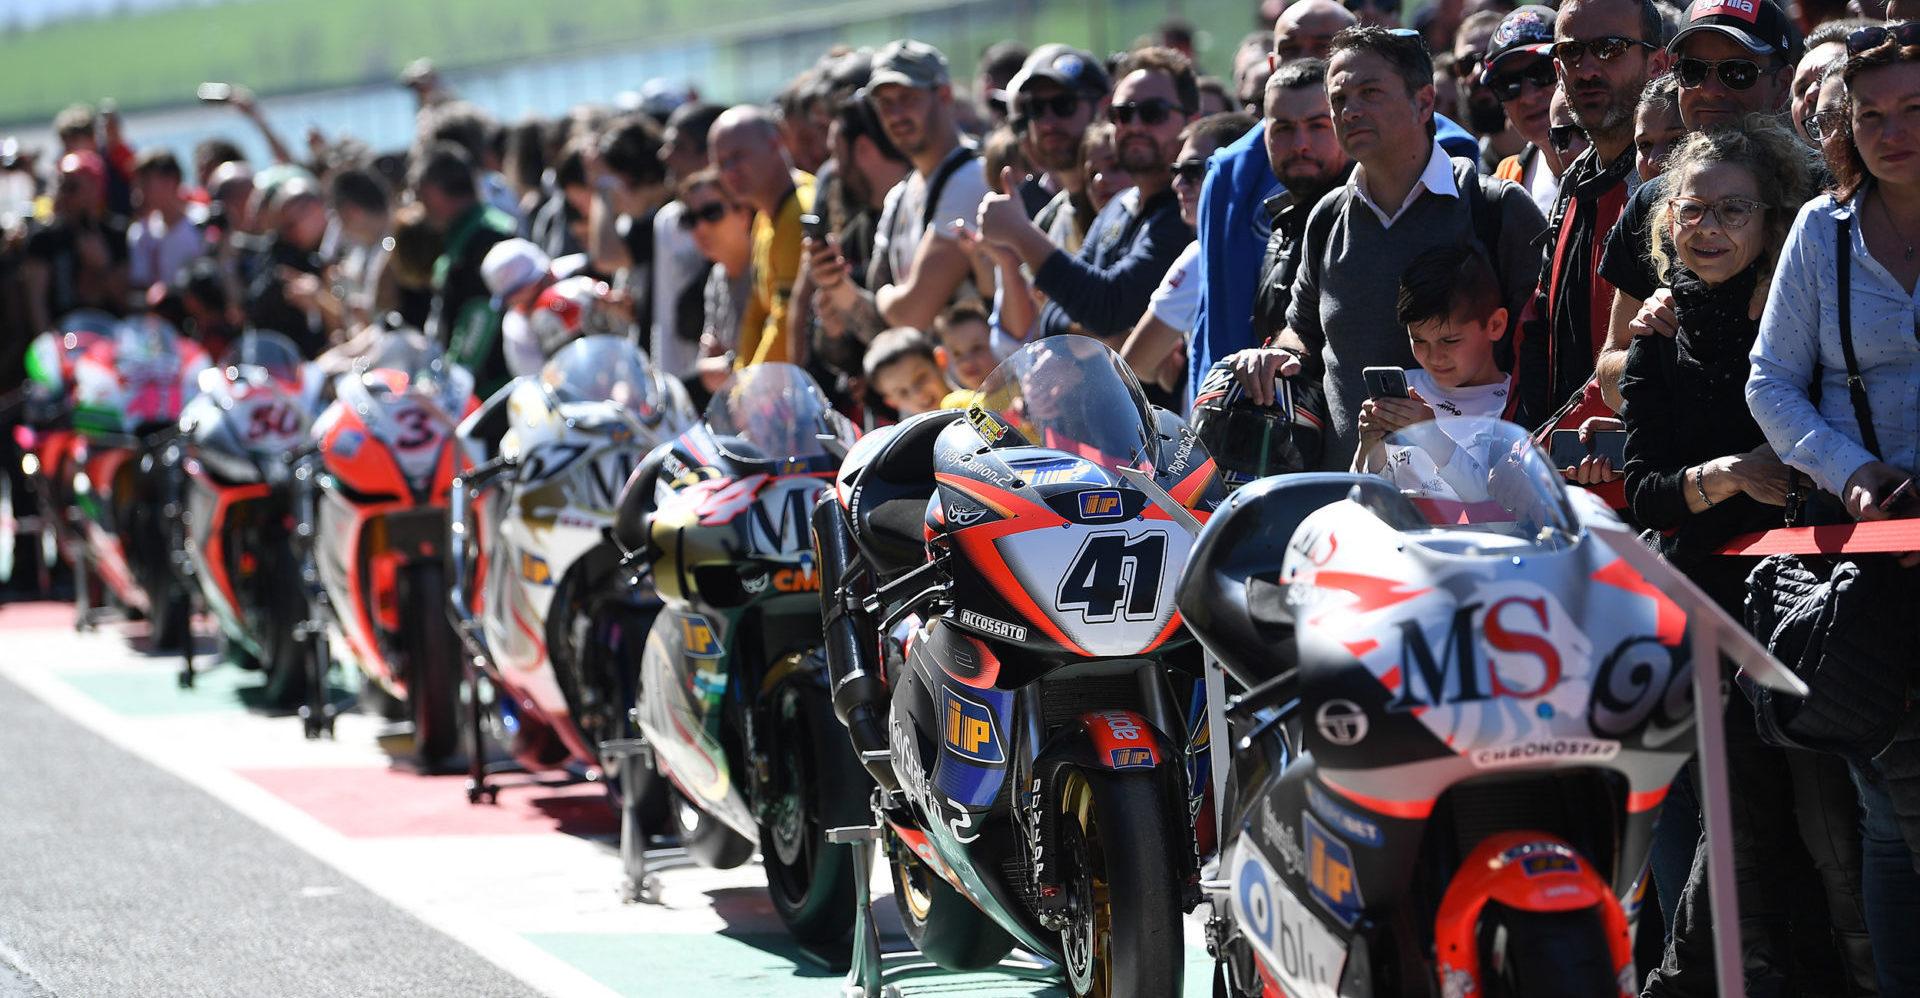 Fans and retired Aprilia racebikes lined up at Aprilia All Stars in 2019. Photo courtesy of Aprilia.